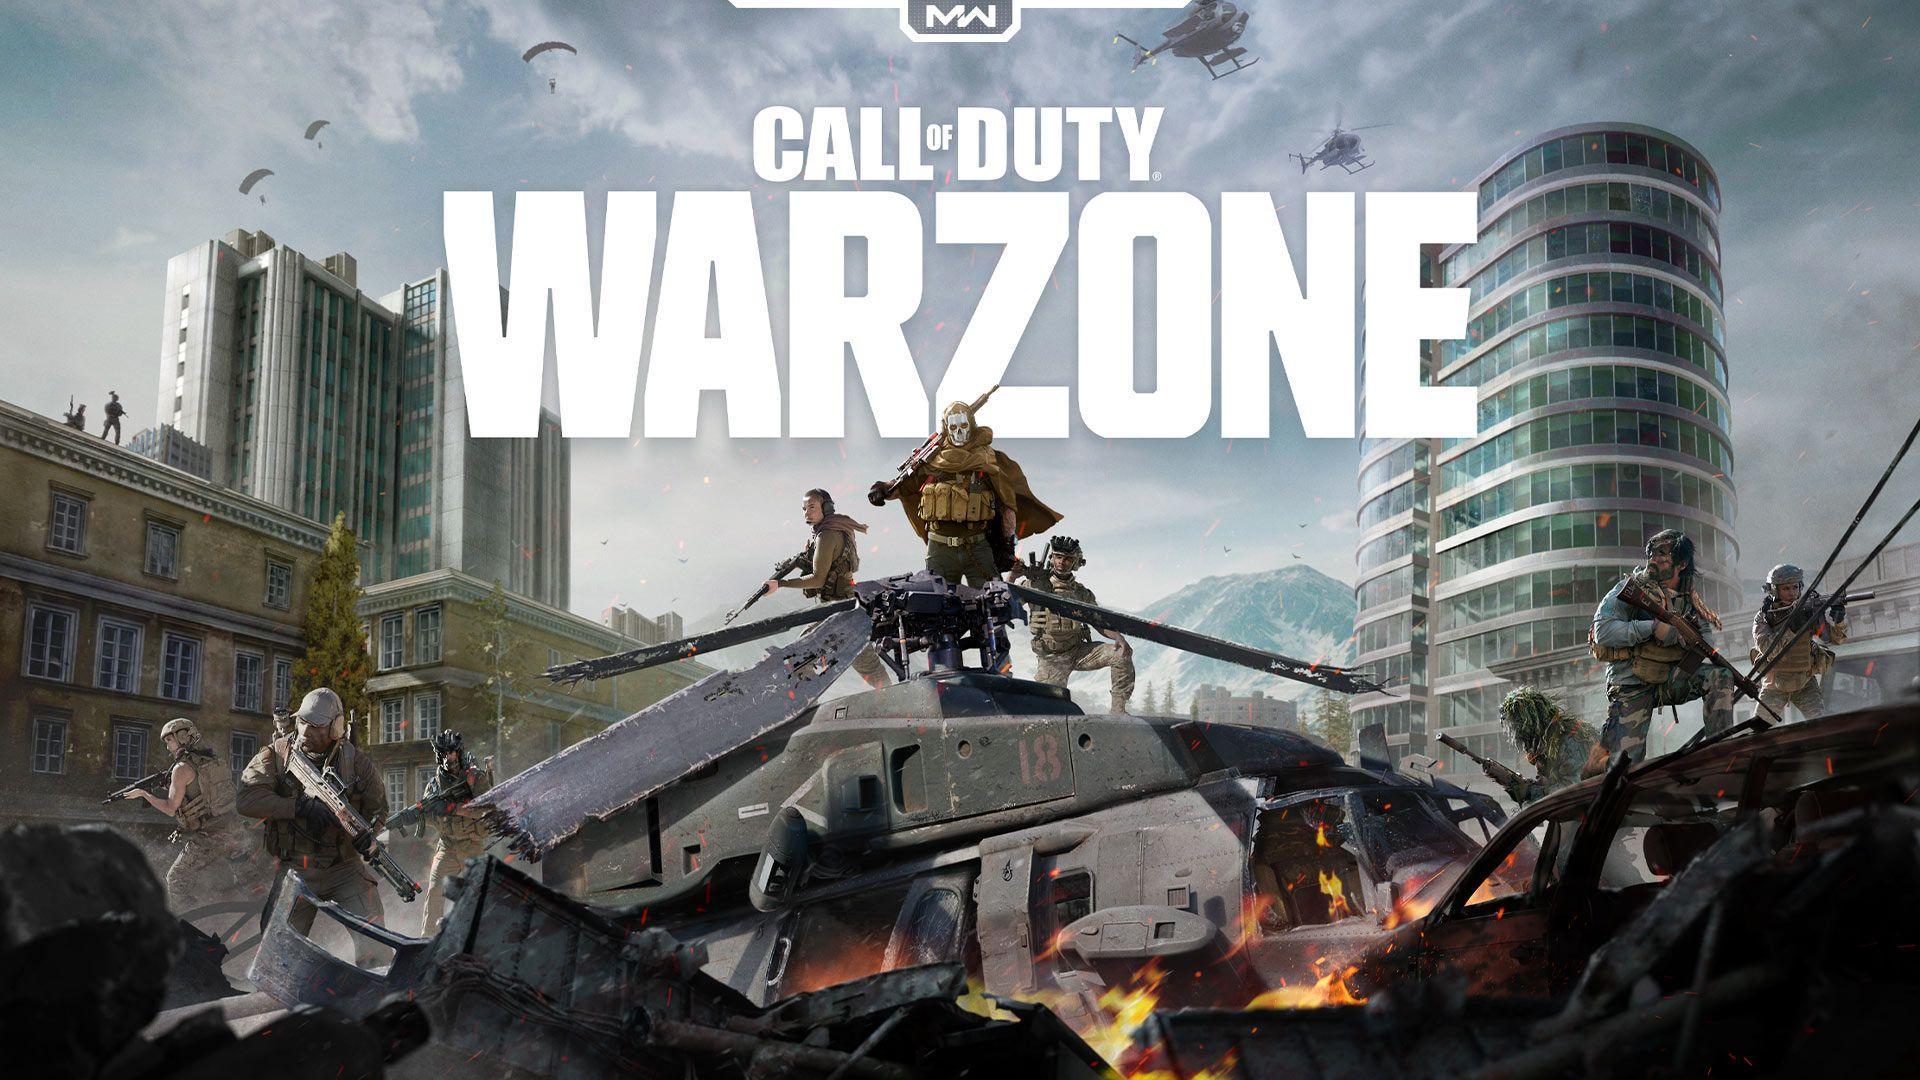 Darmowy tryb wieloosobowy COD Modern Warfare Warzone